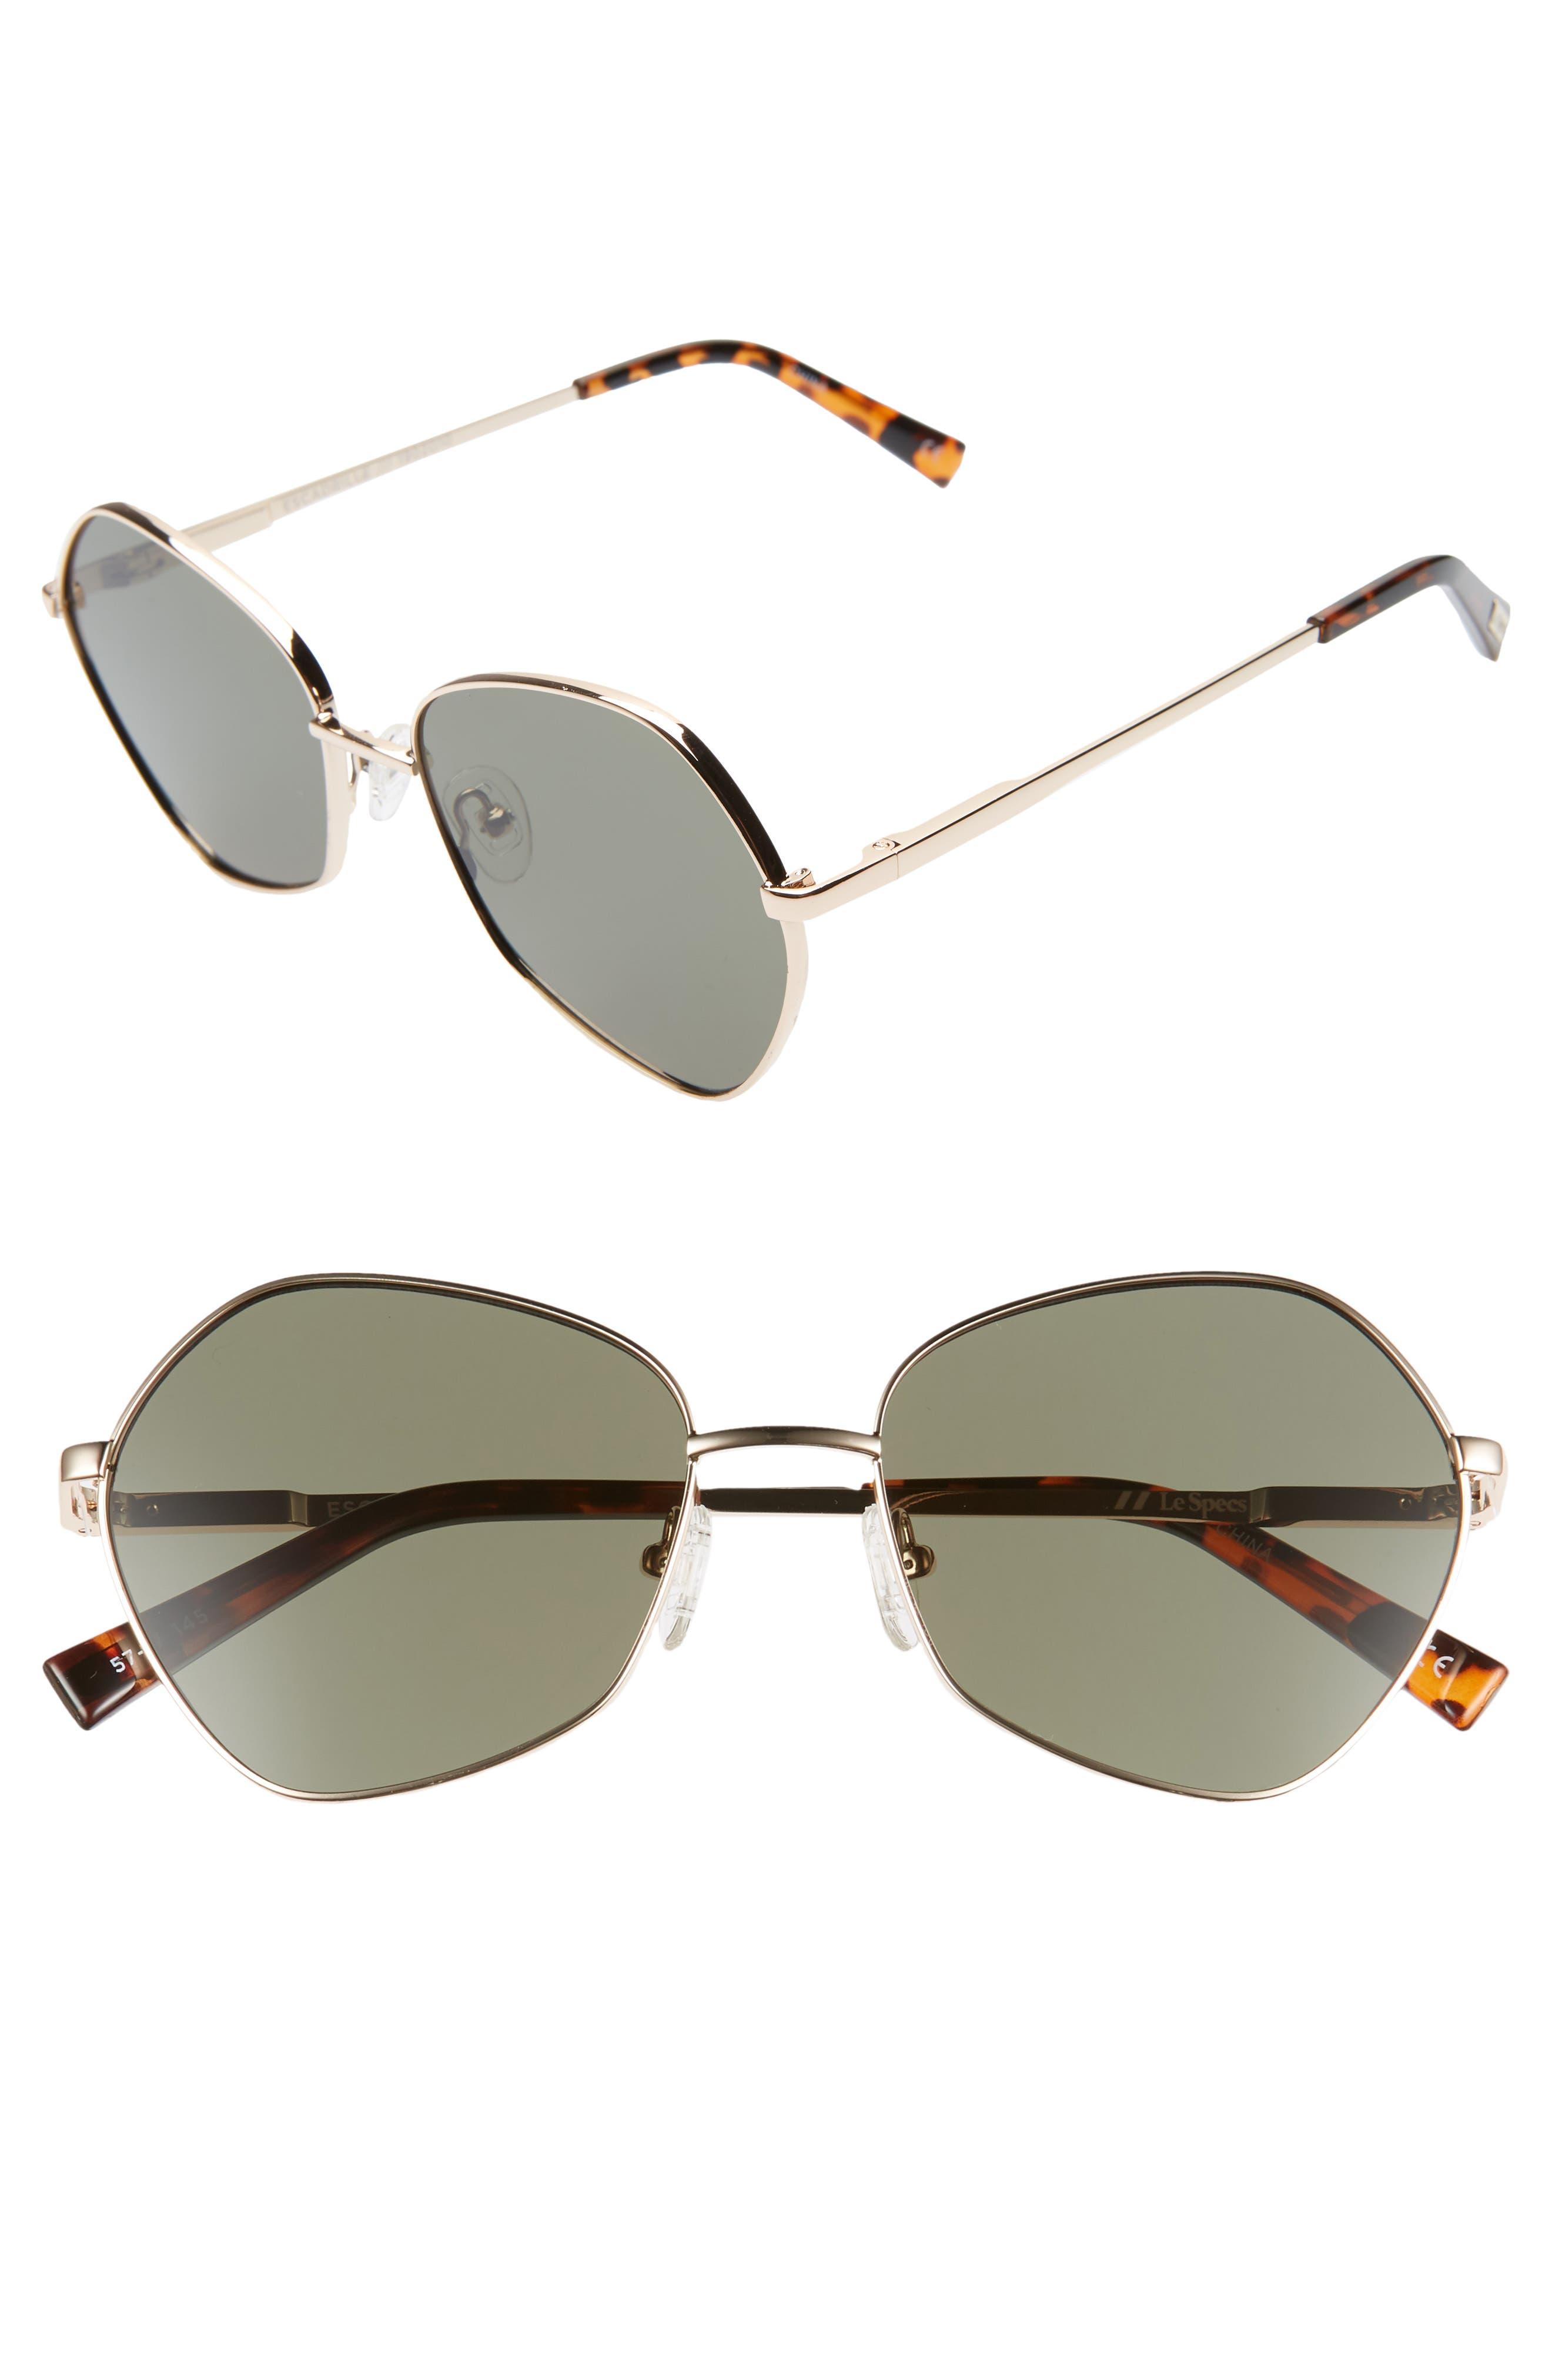 Le Specs Escadrille 57Mm Angular Sunglasses - Bright Gold/ Khaki